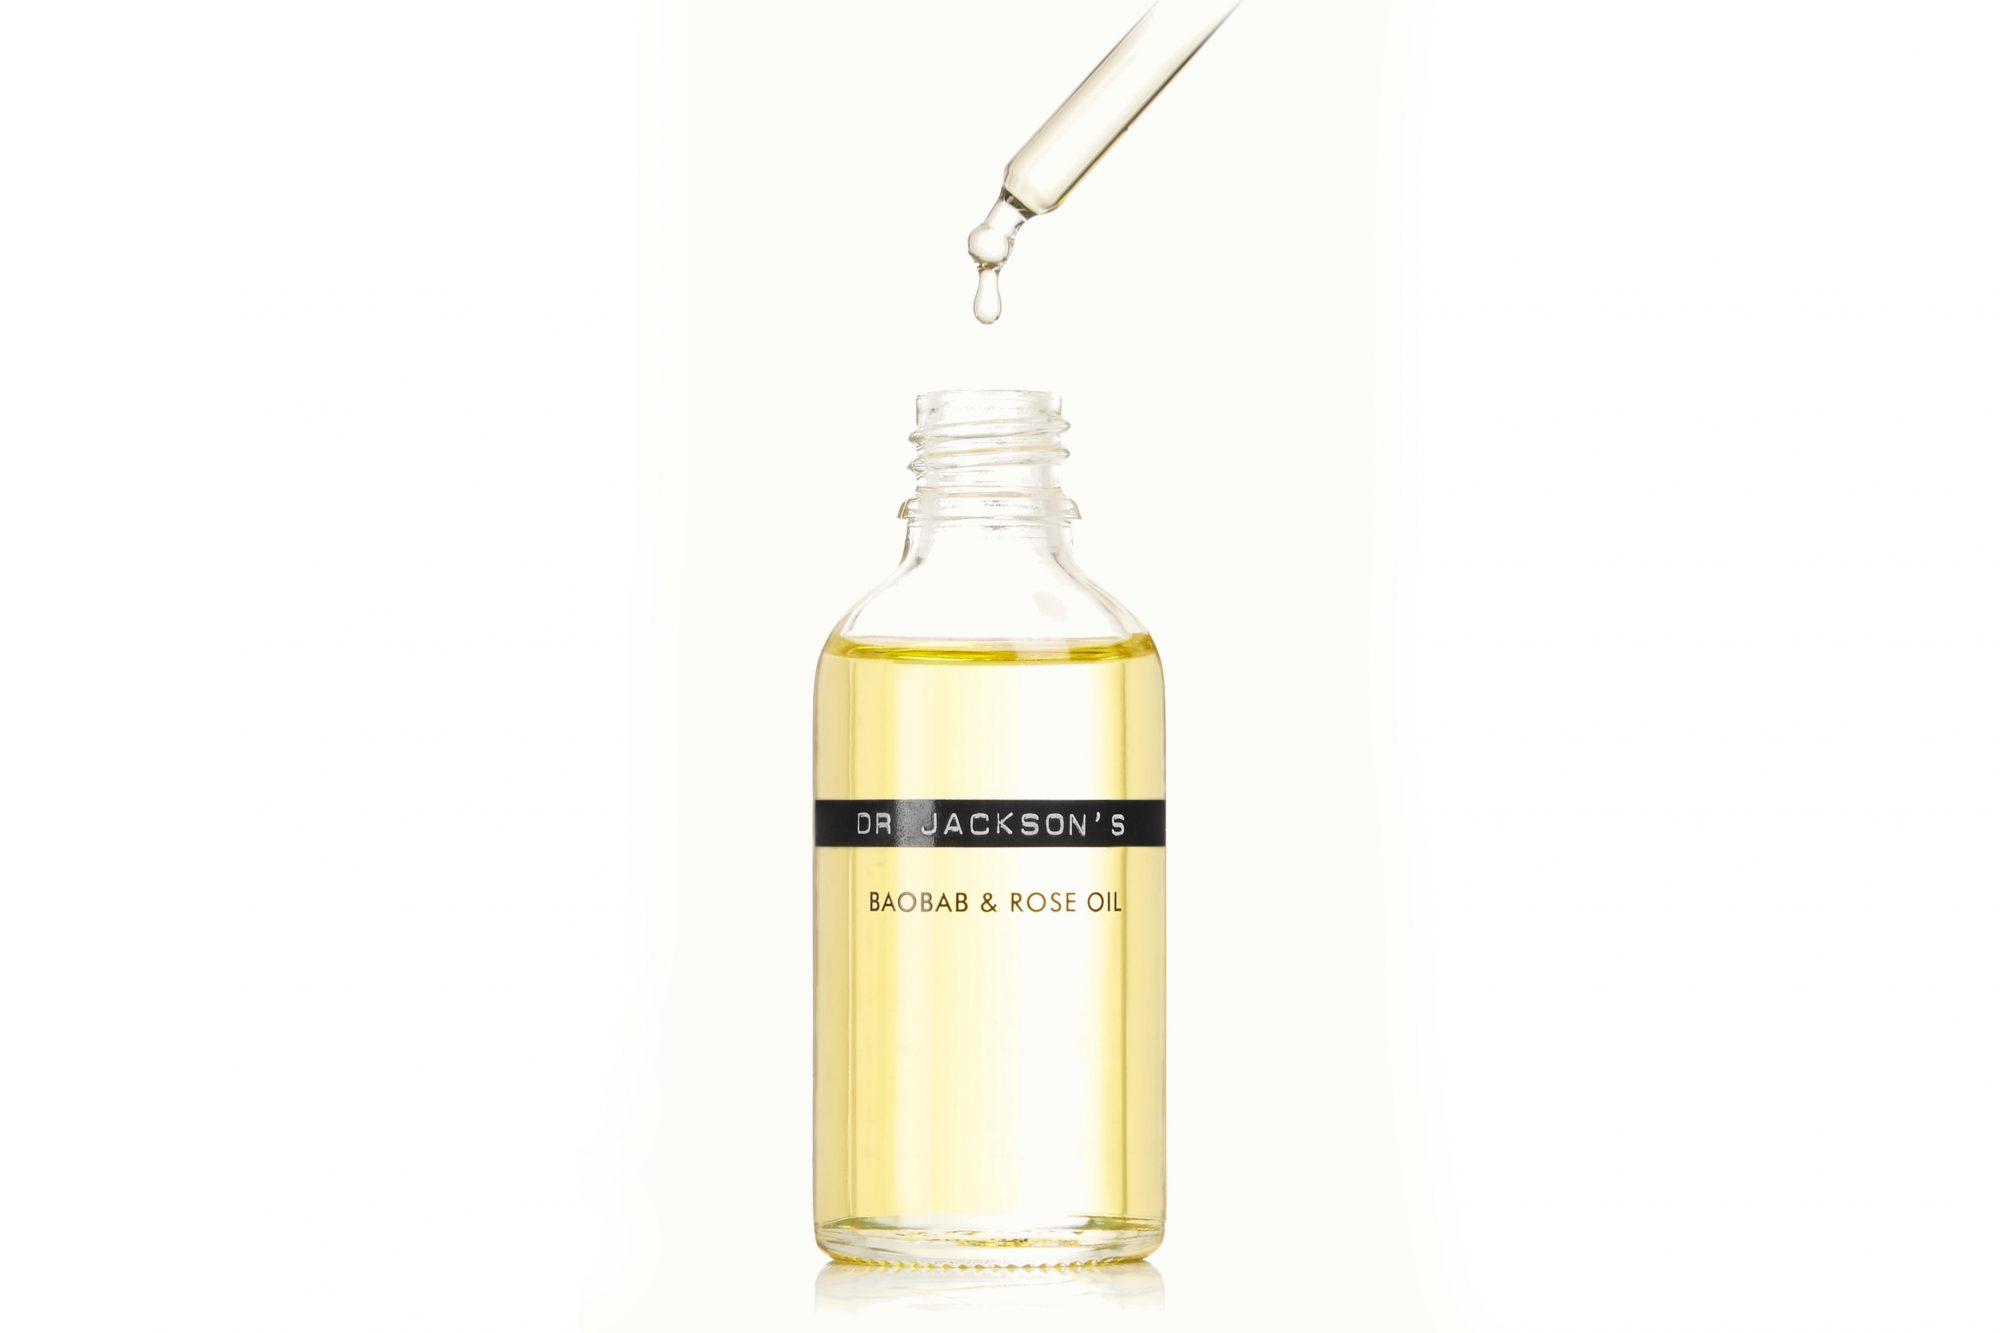 vegan skincare routine dr. Jackson's rose and baobab oil